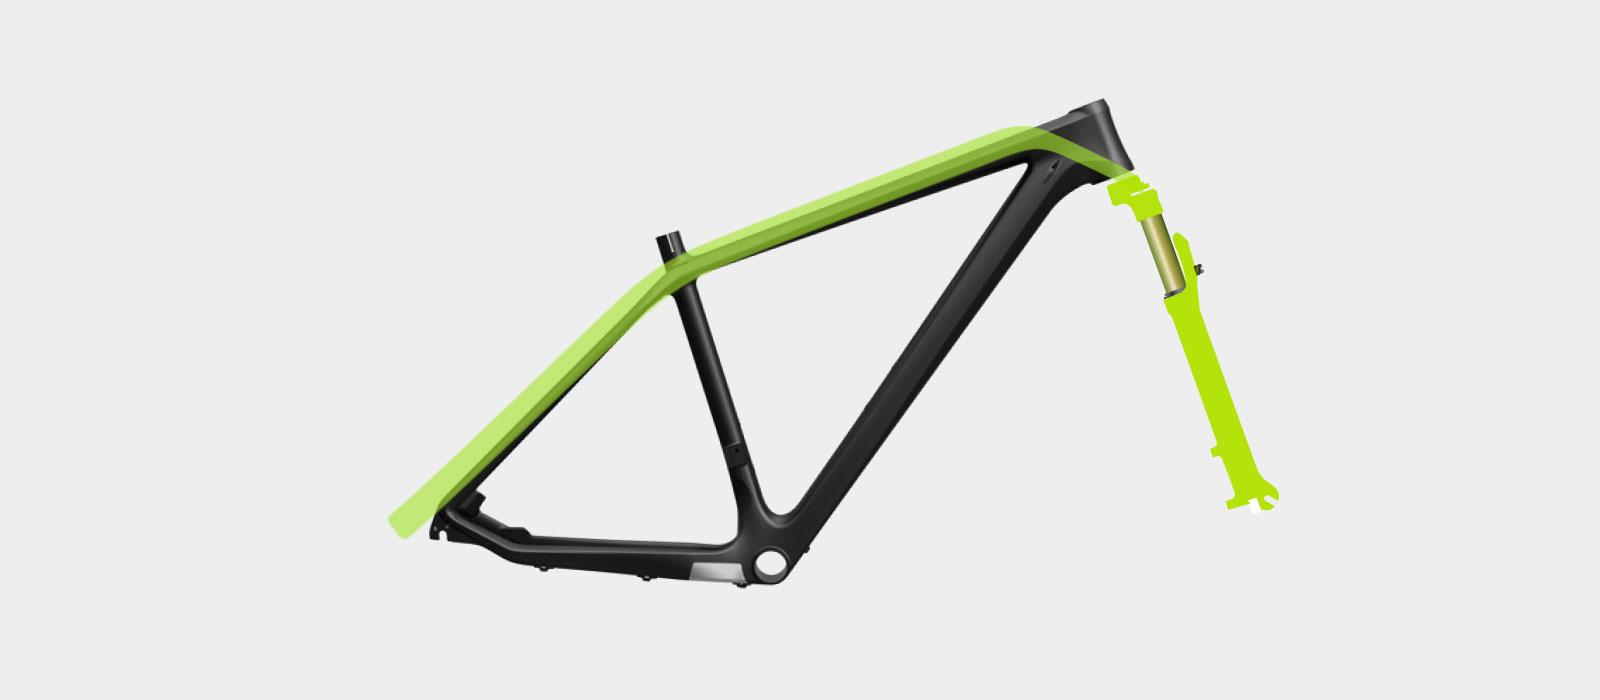 njustudio_cube_bikes_2014_concept